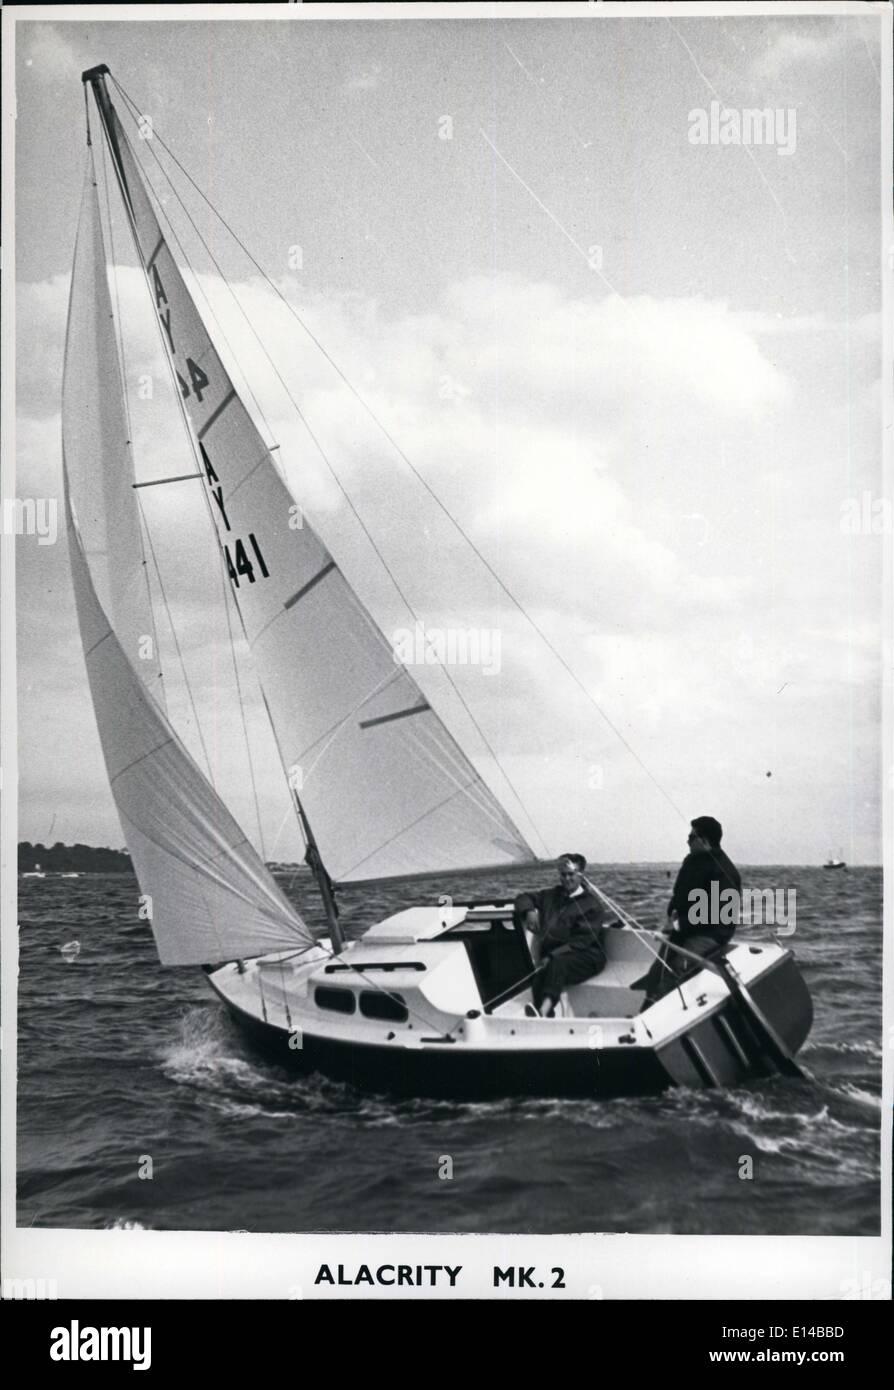 Apr. 17, 2012 - Alacrity Mk. 2 - Stock Image